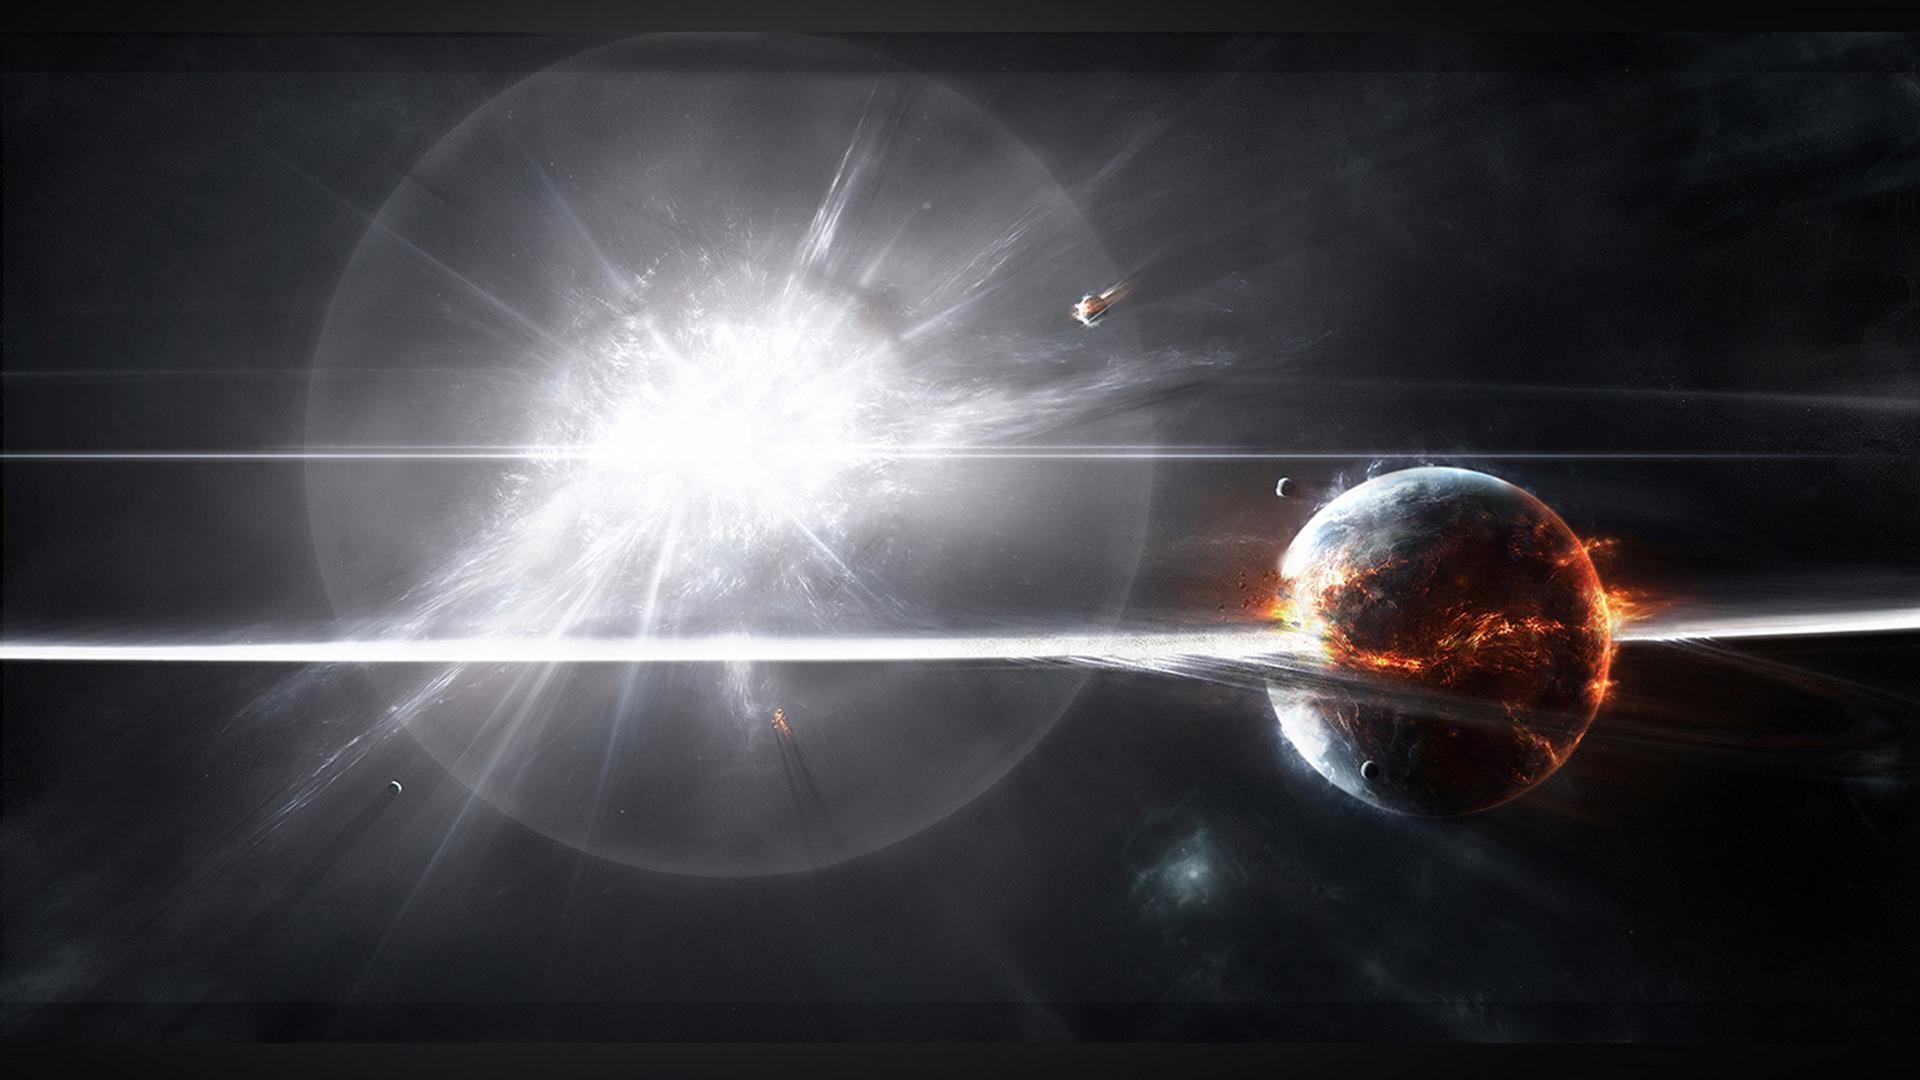 Filename: 27512145-supernova-wallpapers.jpeg